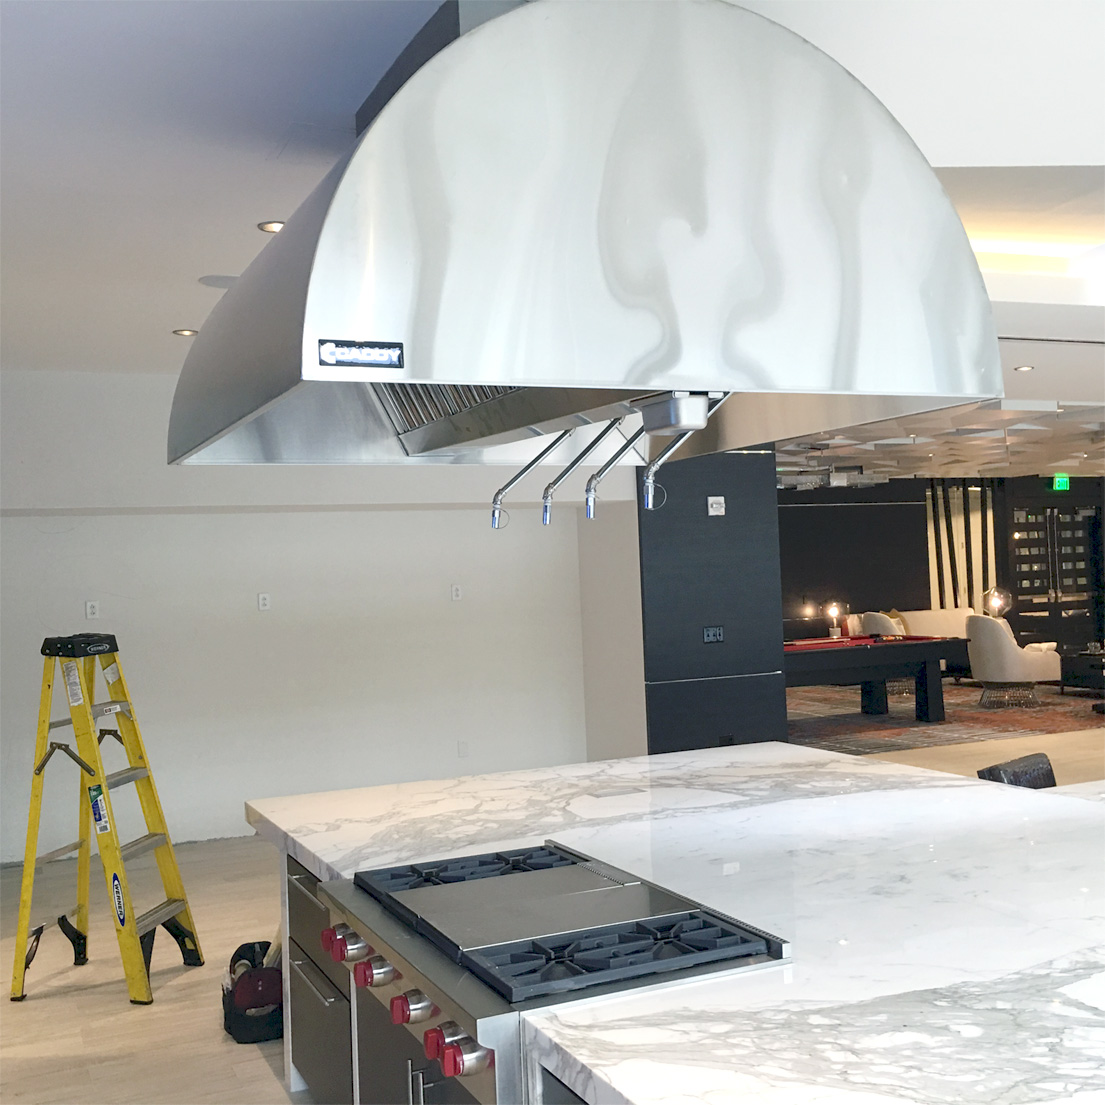 residential kitchen hood fire suppression system buffet  besto blog